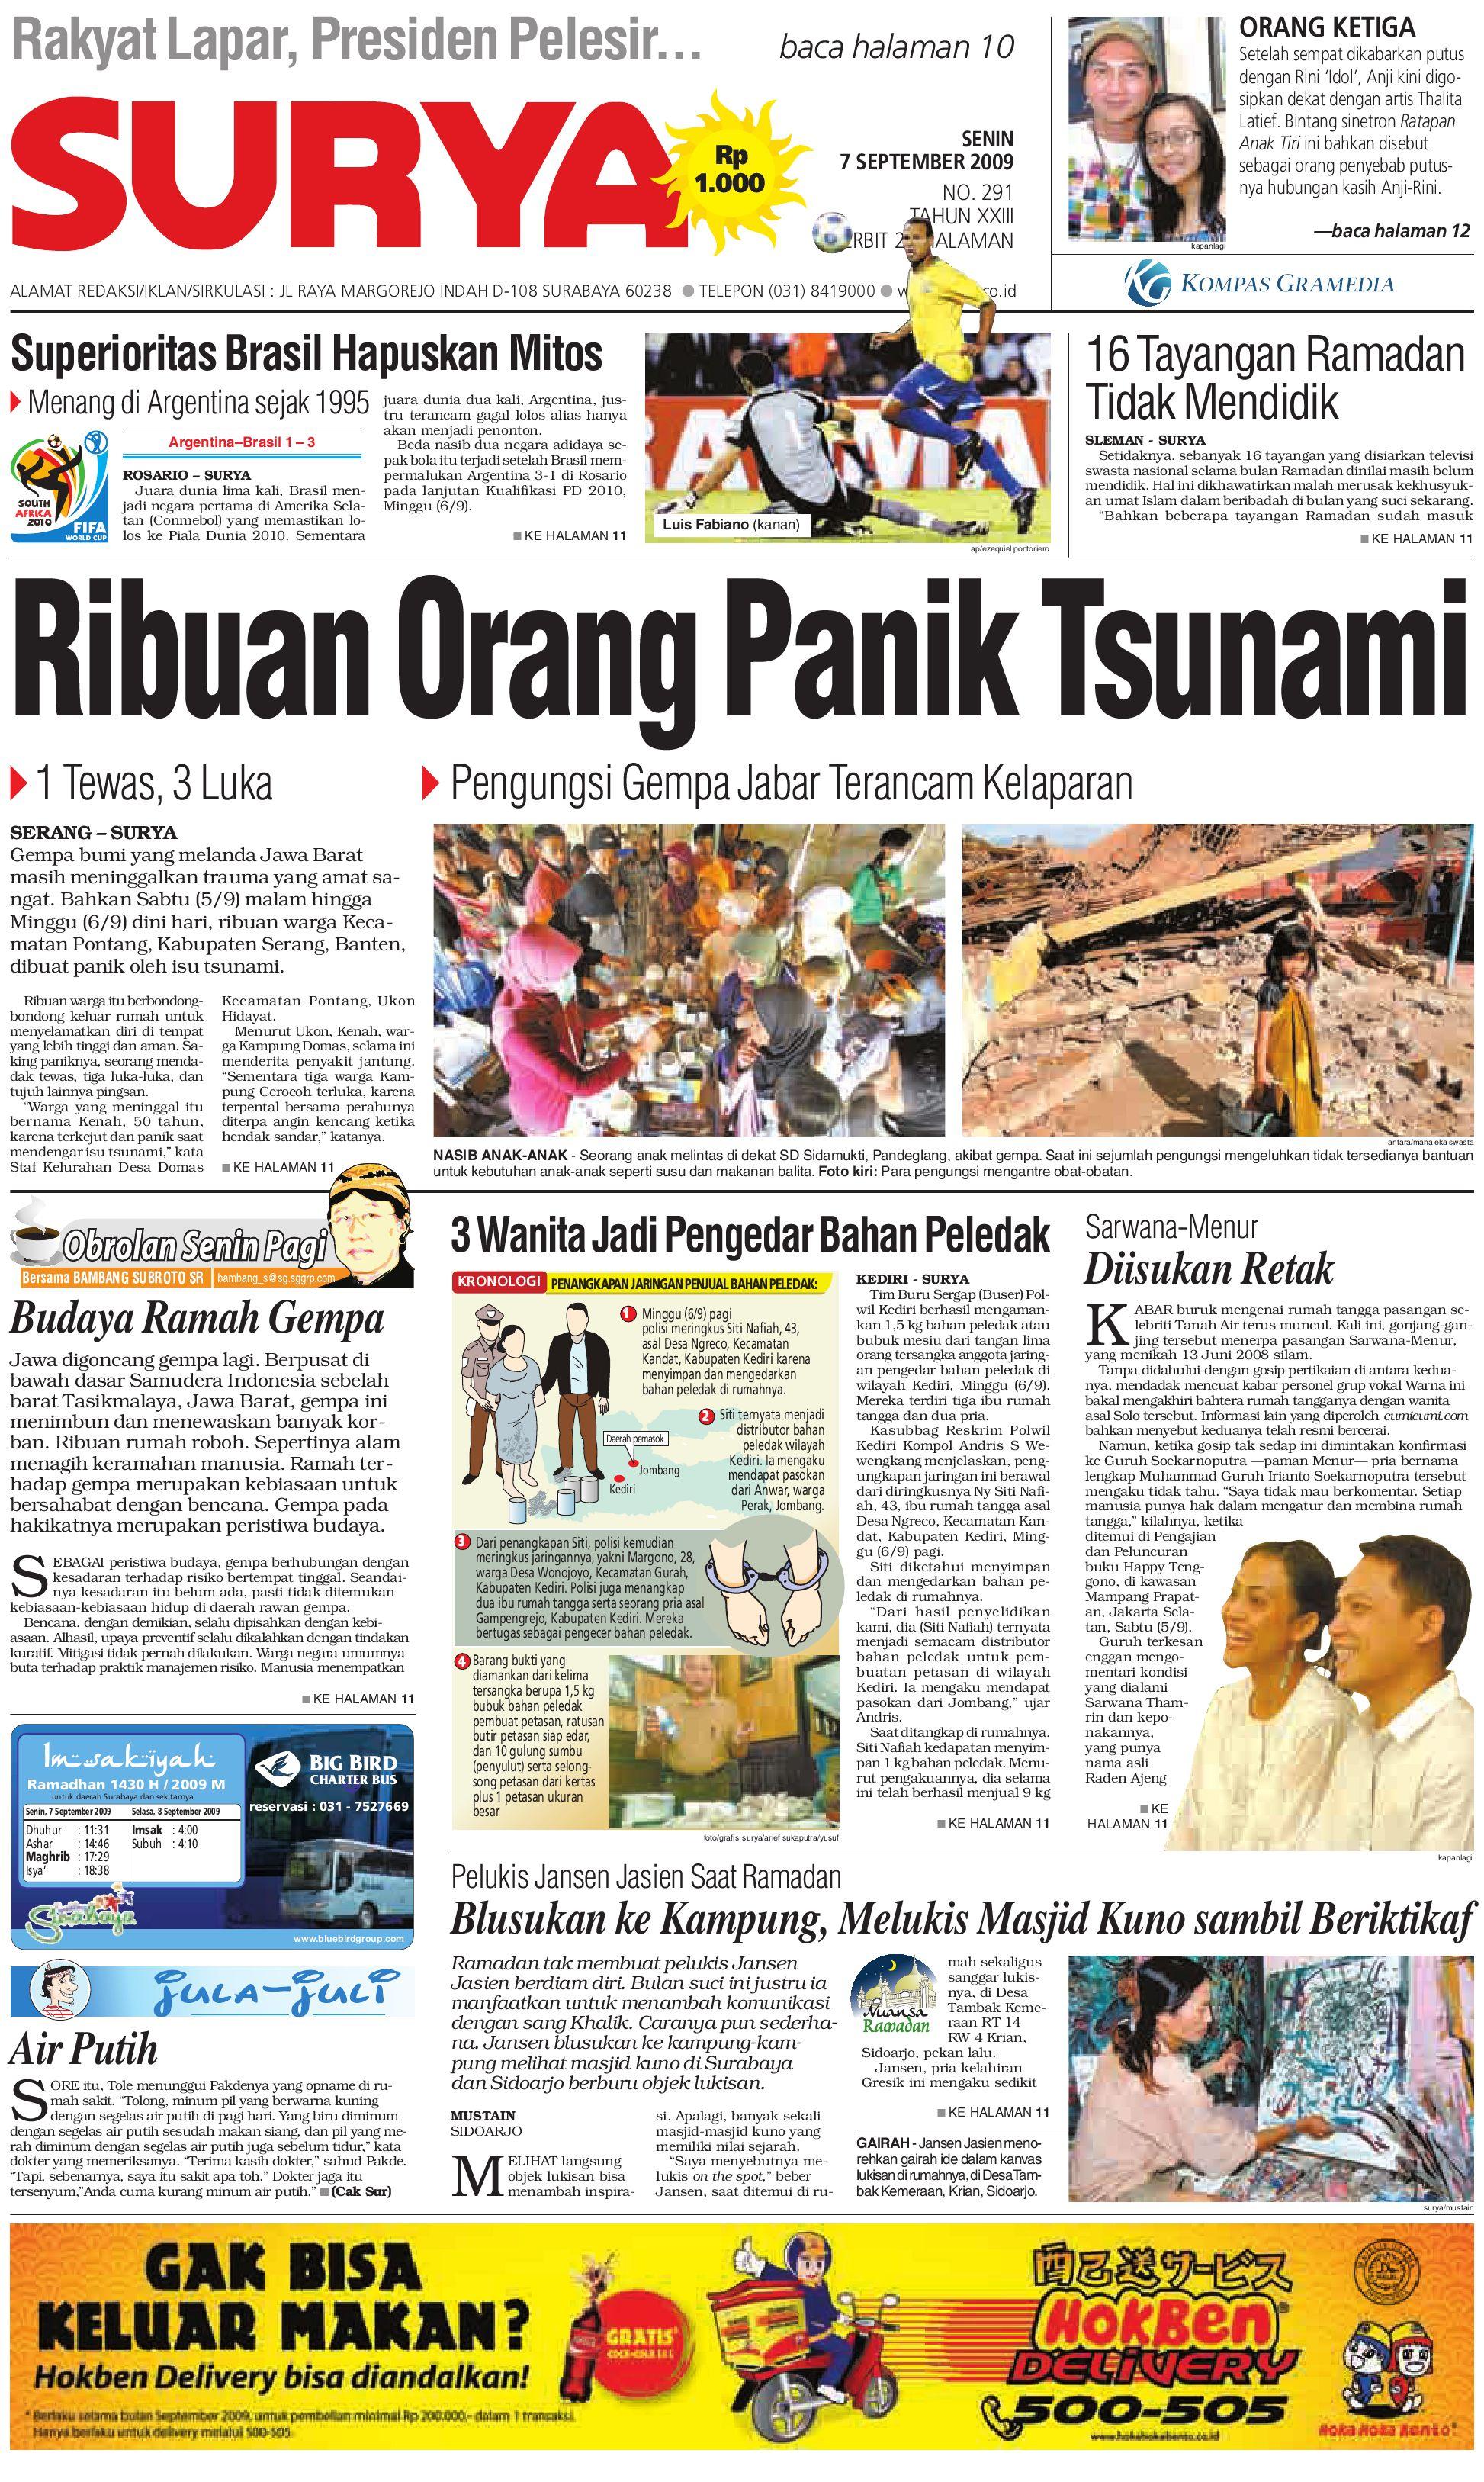 Surya Edisi Cetak 07 Sept 09 By Harian Issuu Kuliner Aneka Sambal Sambel Uleg Ibu Yayuk Bdg